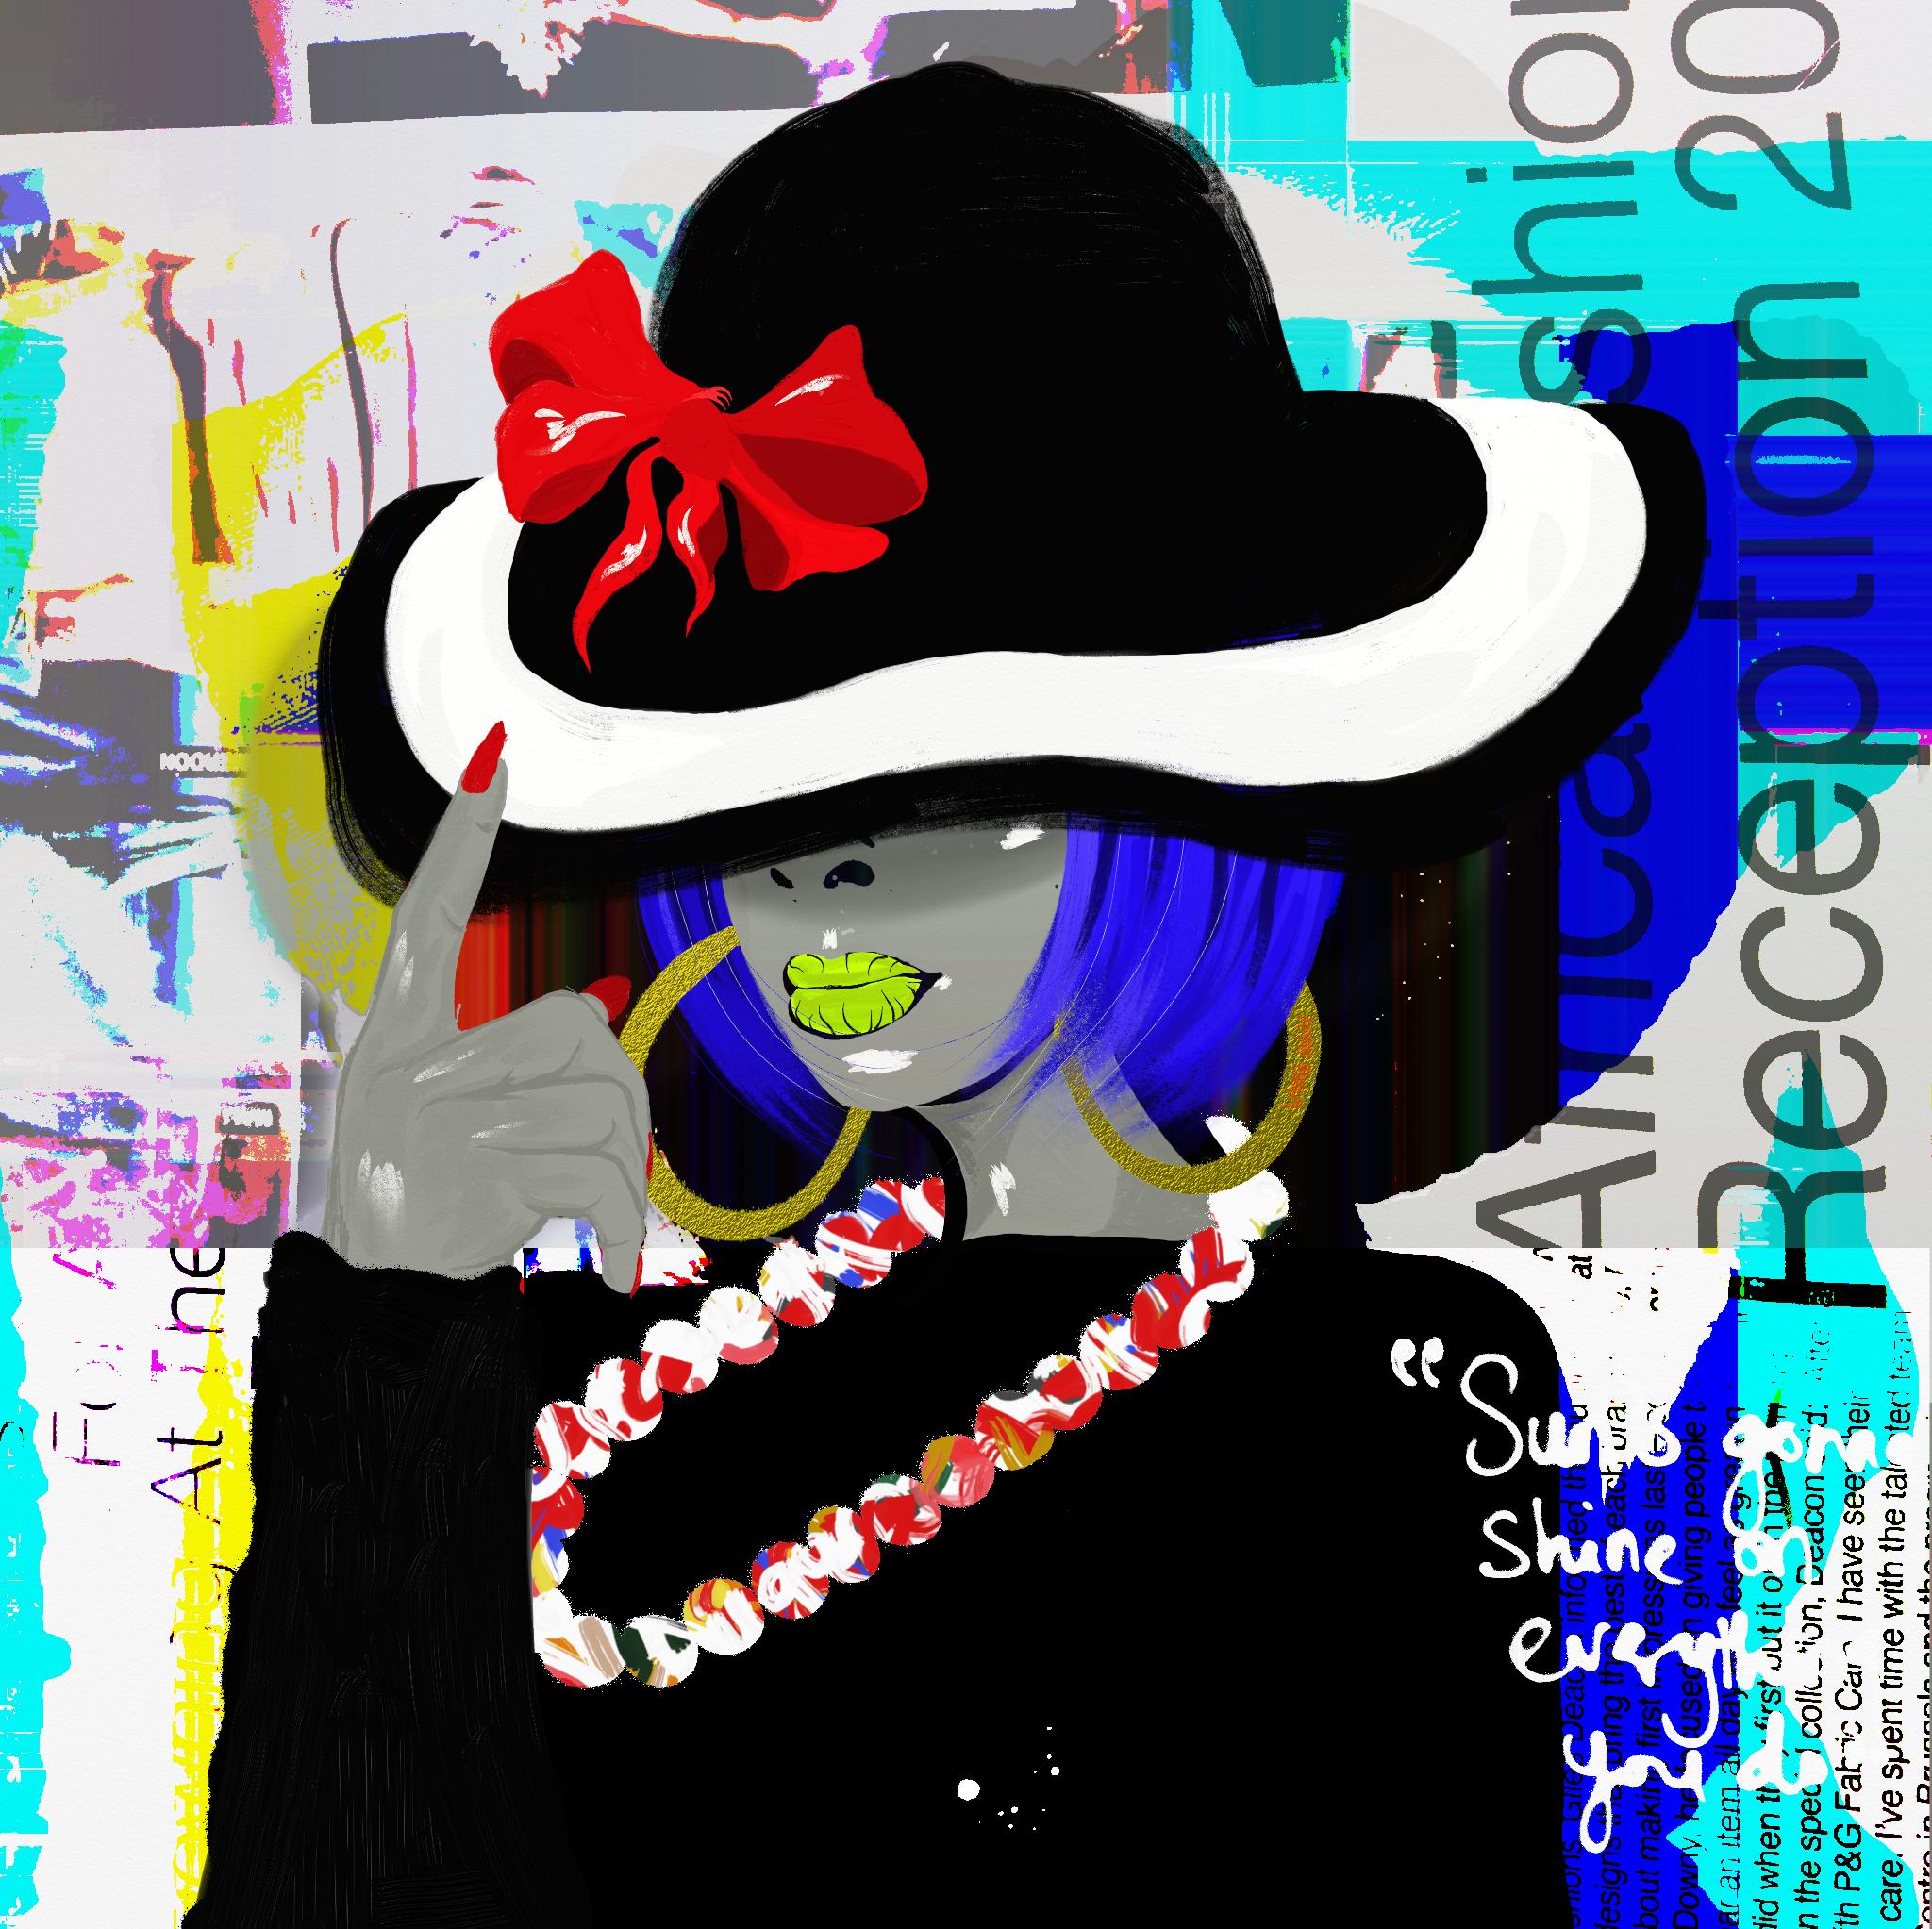 Fashionista_003.png